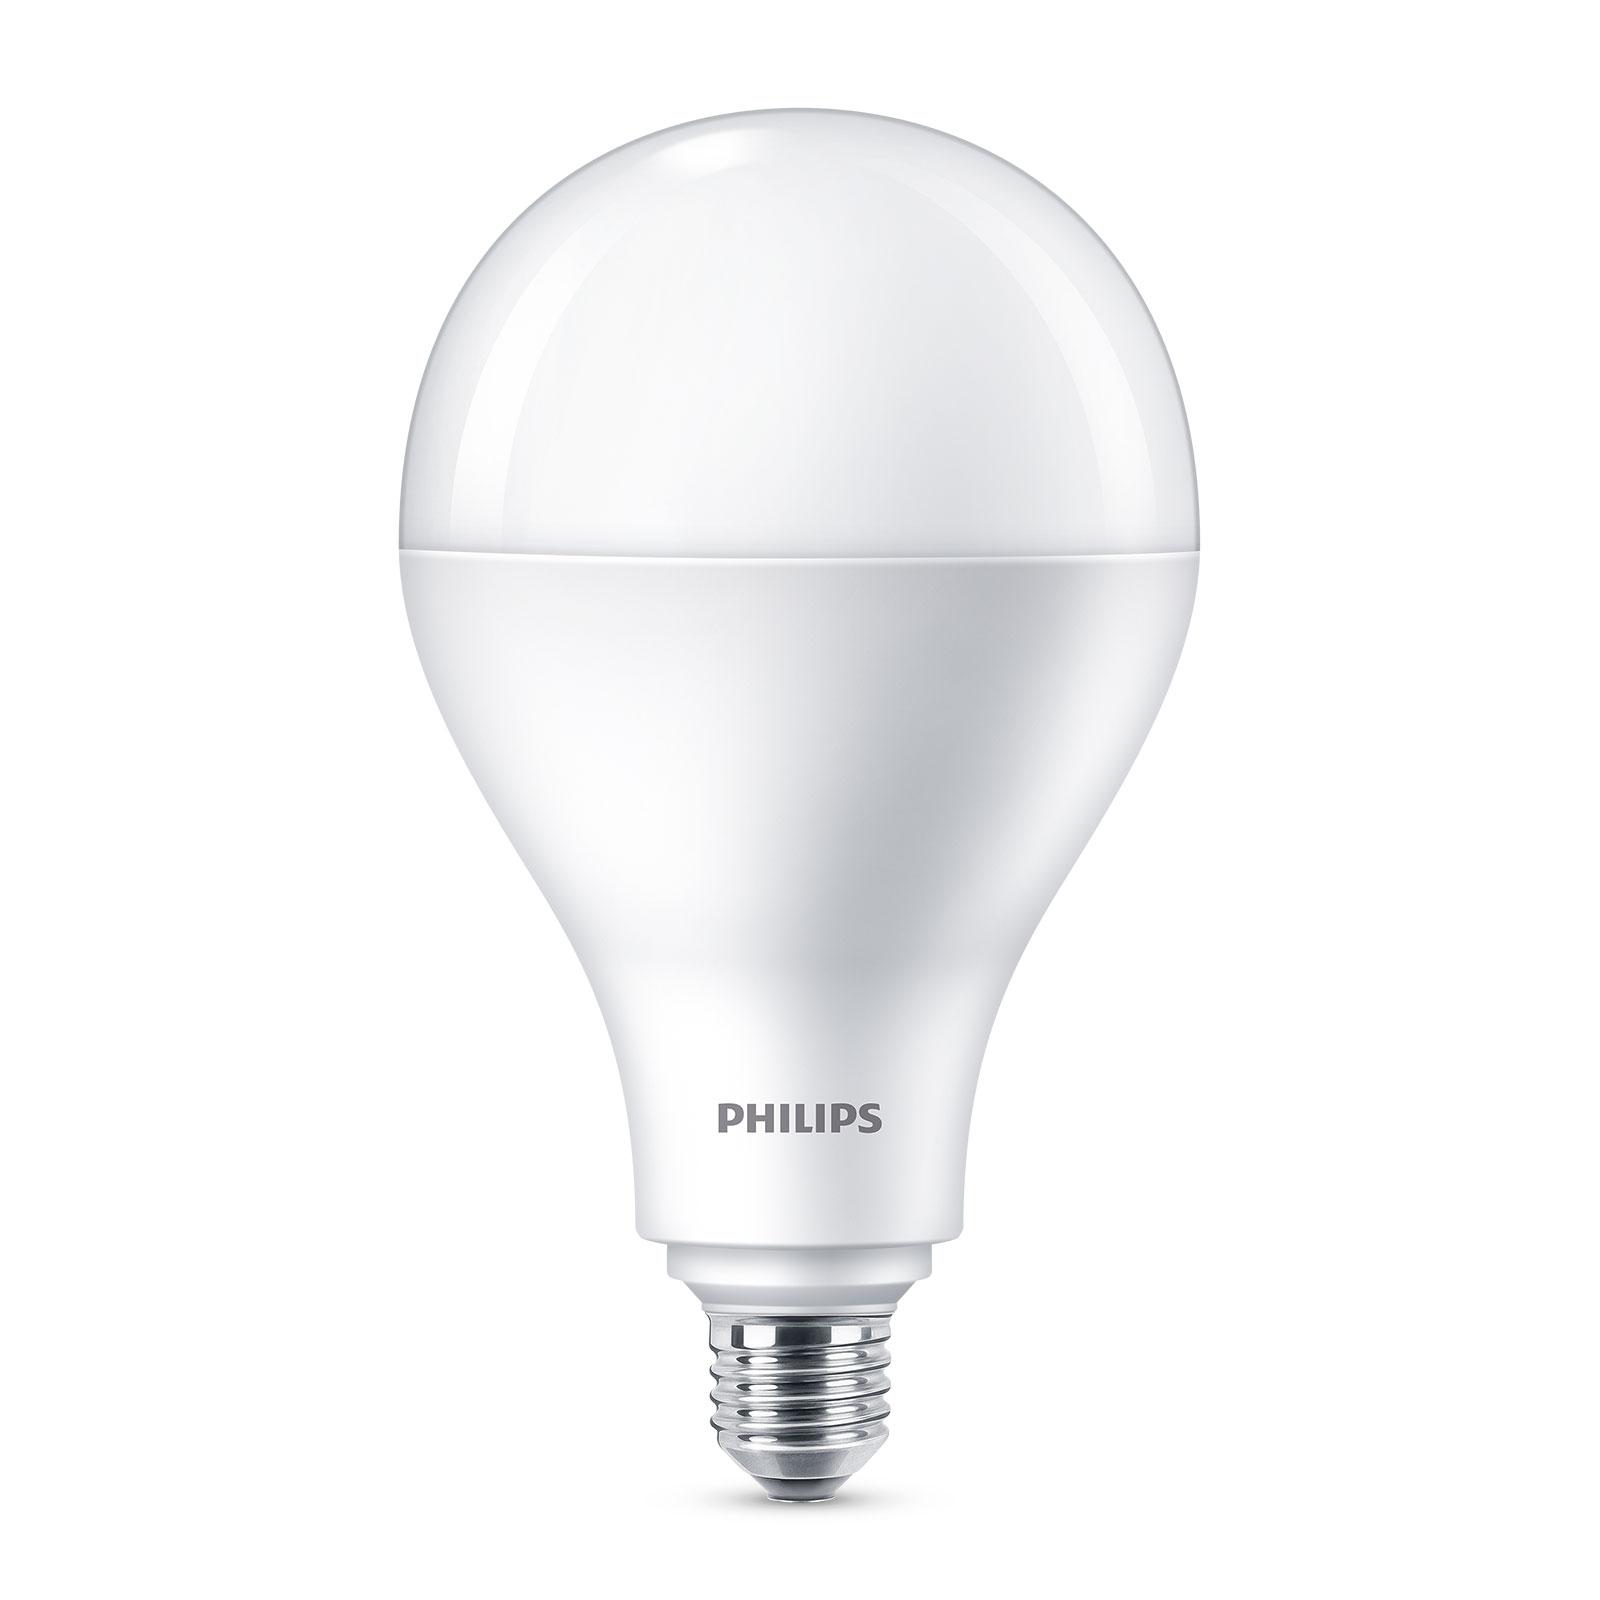 Philips LED-pære E27 A95 23 W 2700K